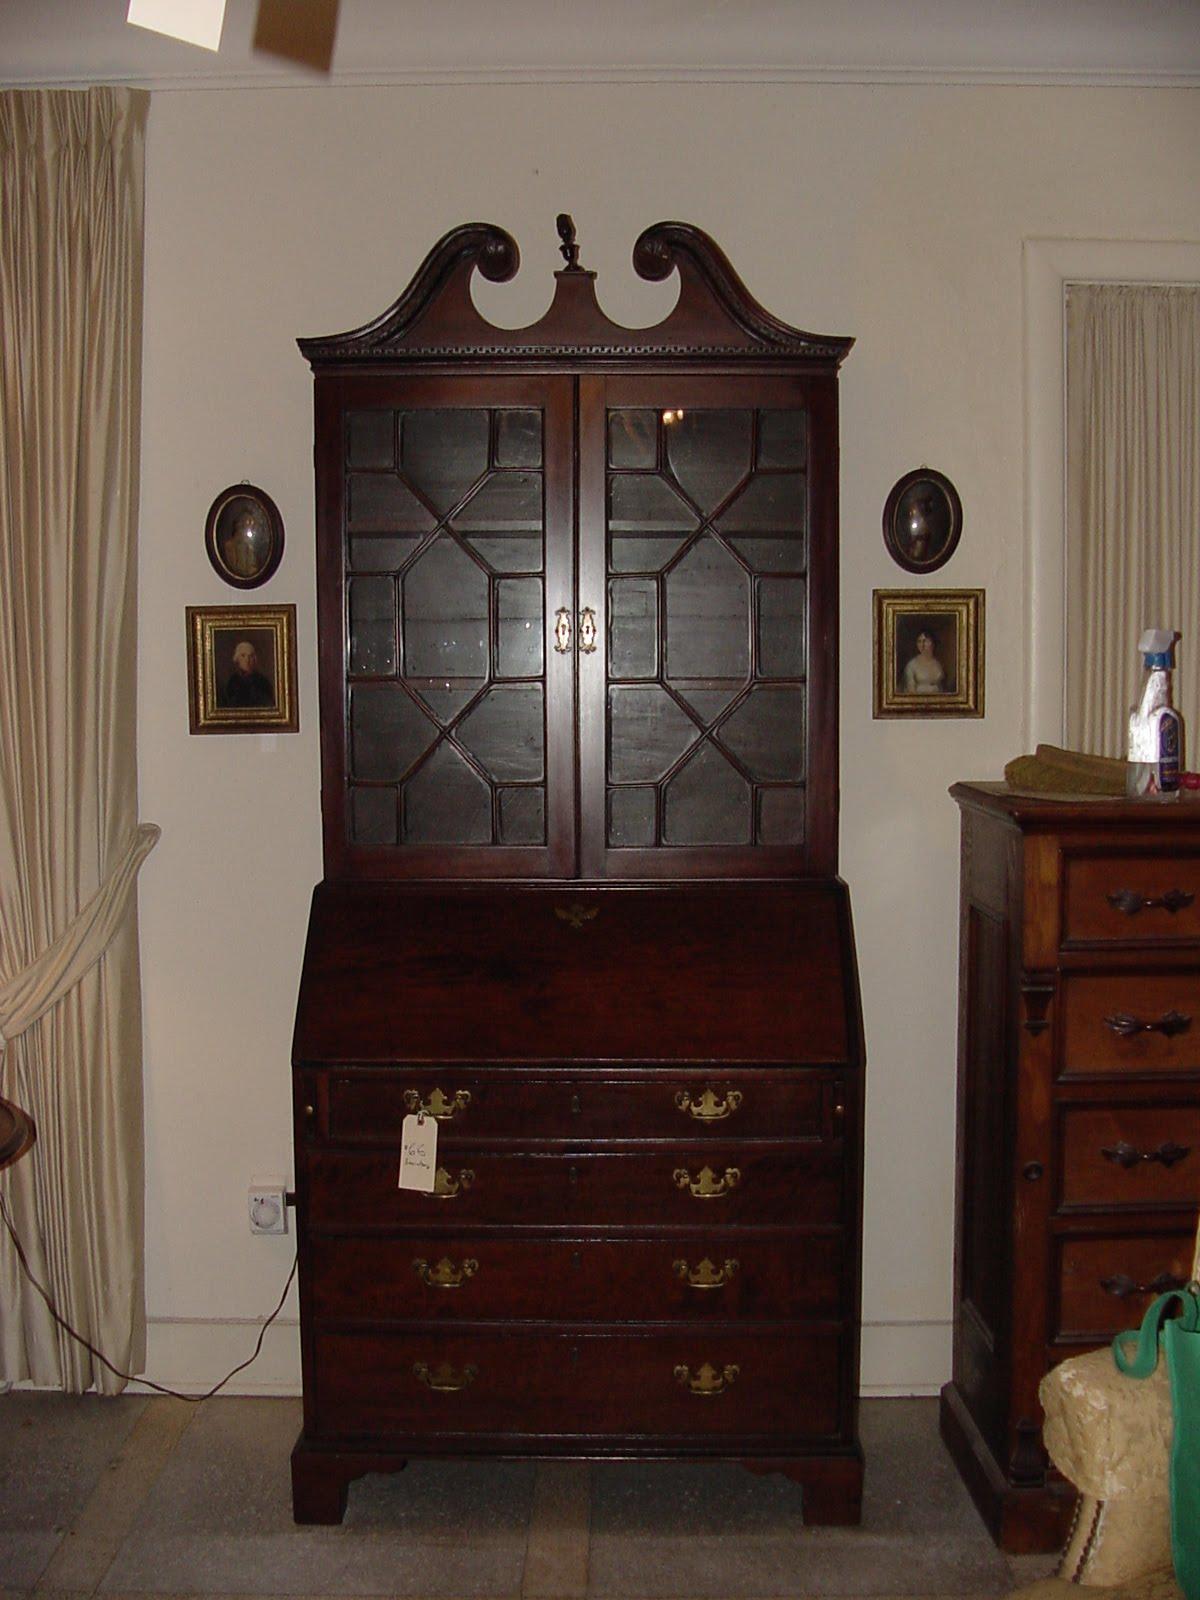 antique mahogany secretary desk A Connoisseur's Corner: A GEORGE III MAHOGANY SECRETARY DESK antique mahogany secretary desk